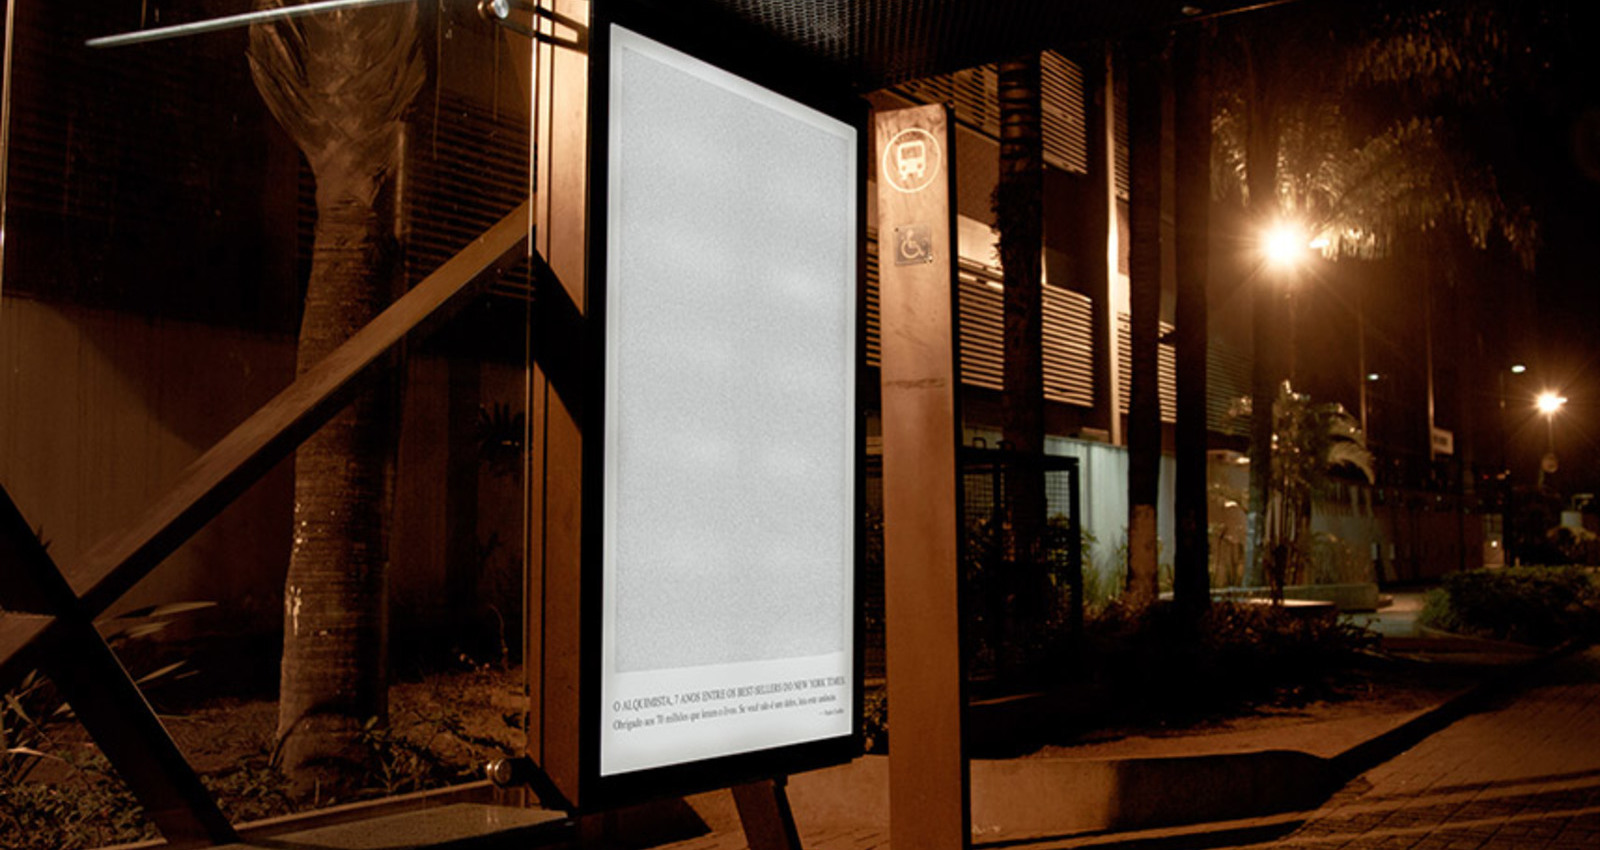 The Alchemist Ad